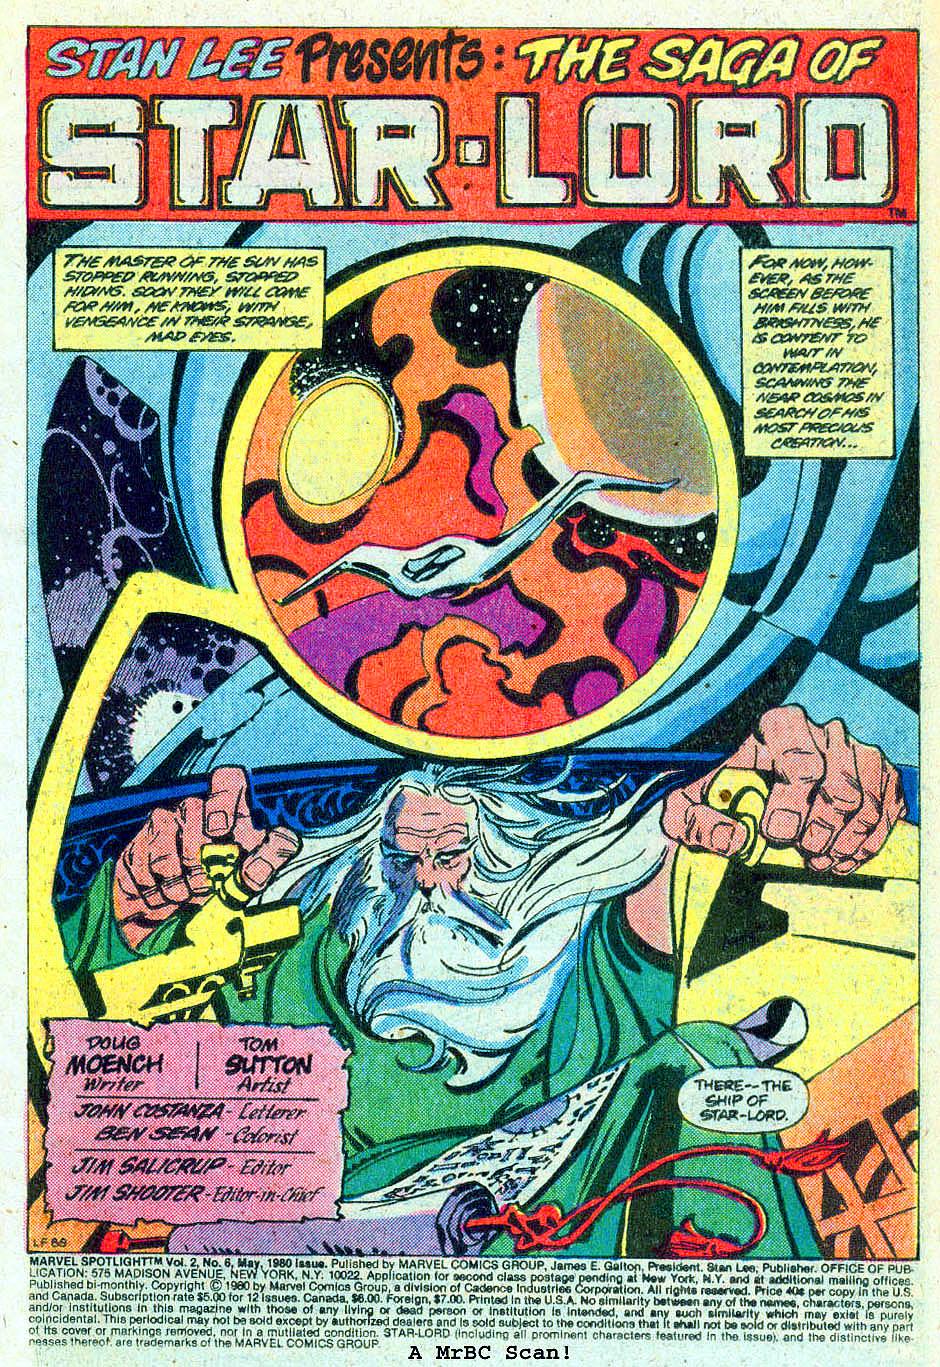 Ragnar (Earth-791)/Gallery